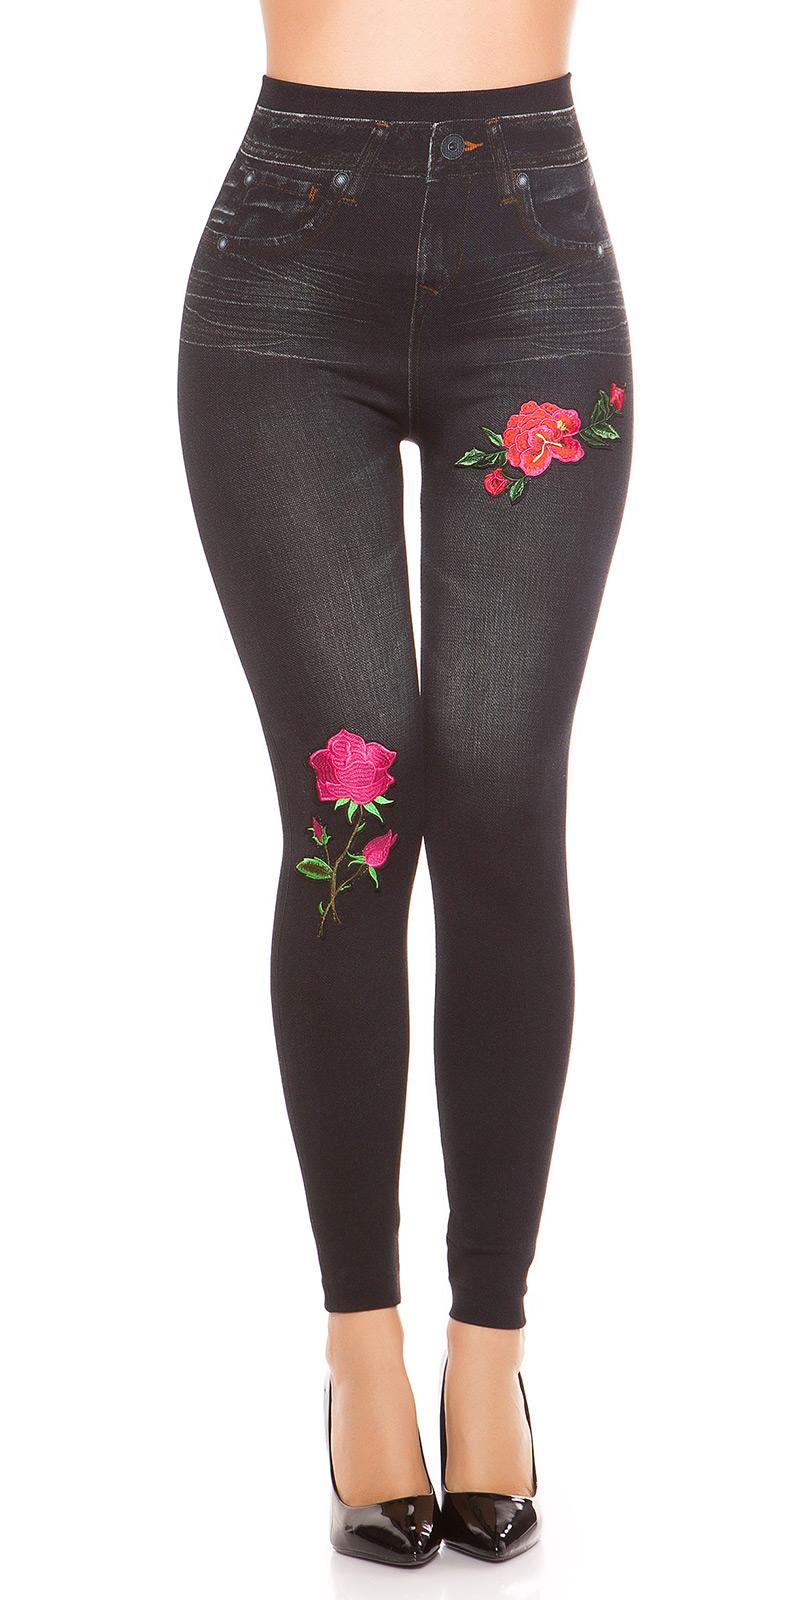 trendstylez leggings in jeans optik mit bl ten patch. Black Bedroom Furniture Sets. Home Design Ideas